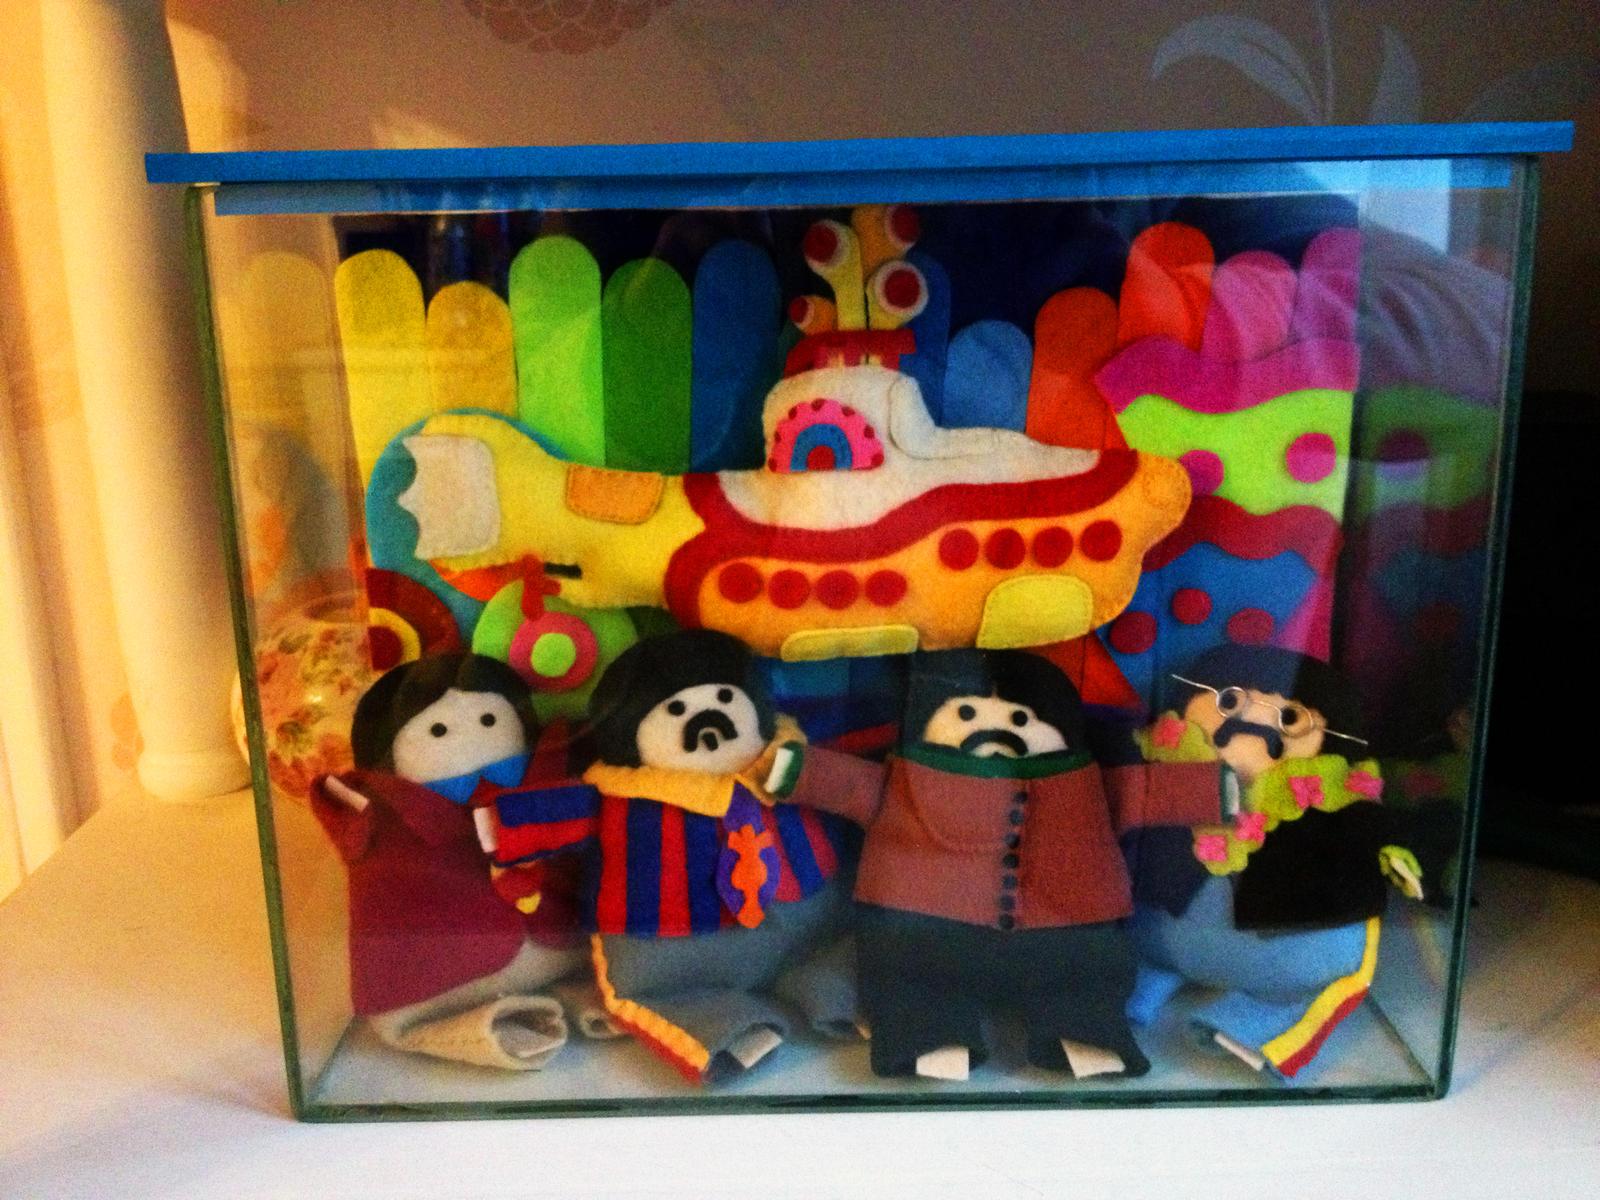 Beatle Movies Related Art On Beatlesmaniaclub Deviantart